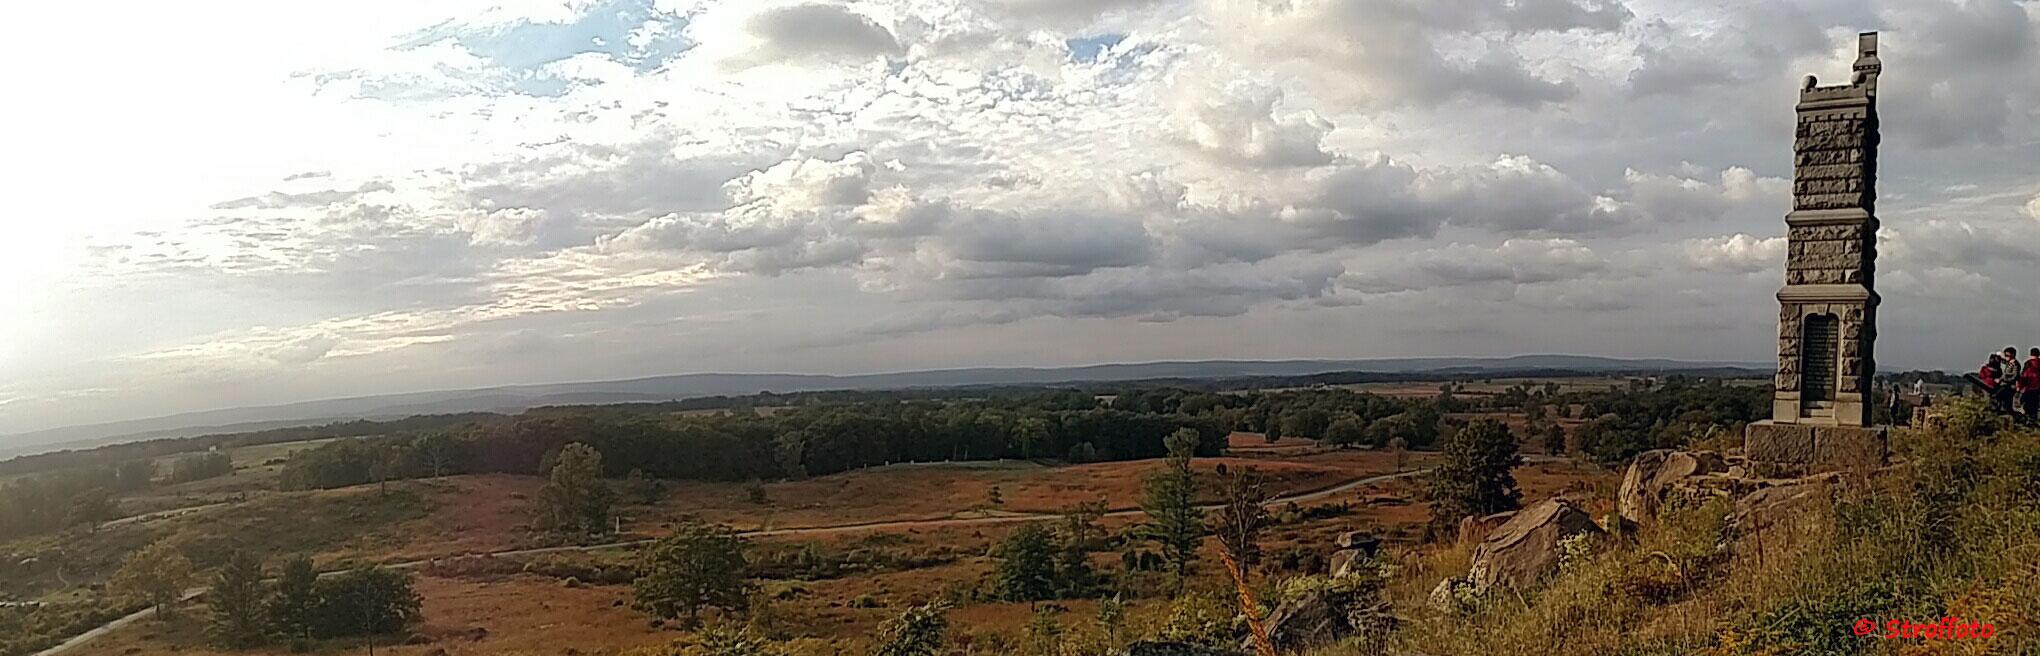 View of Gettysburg Battlefield